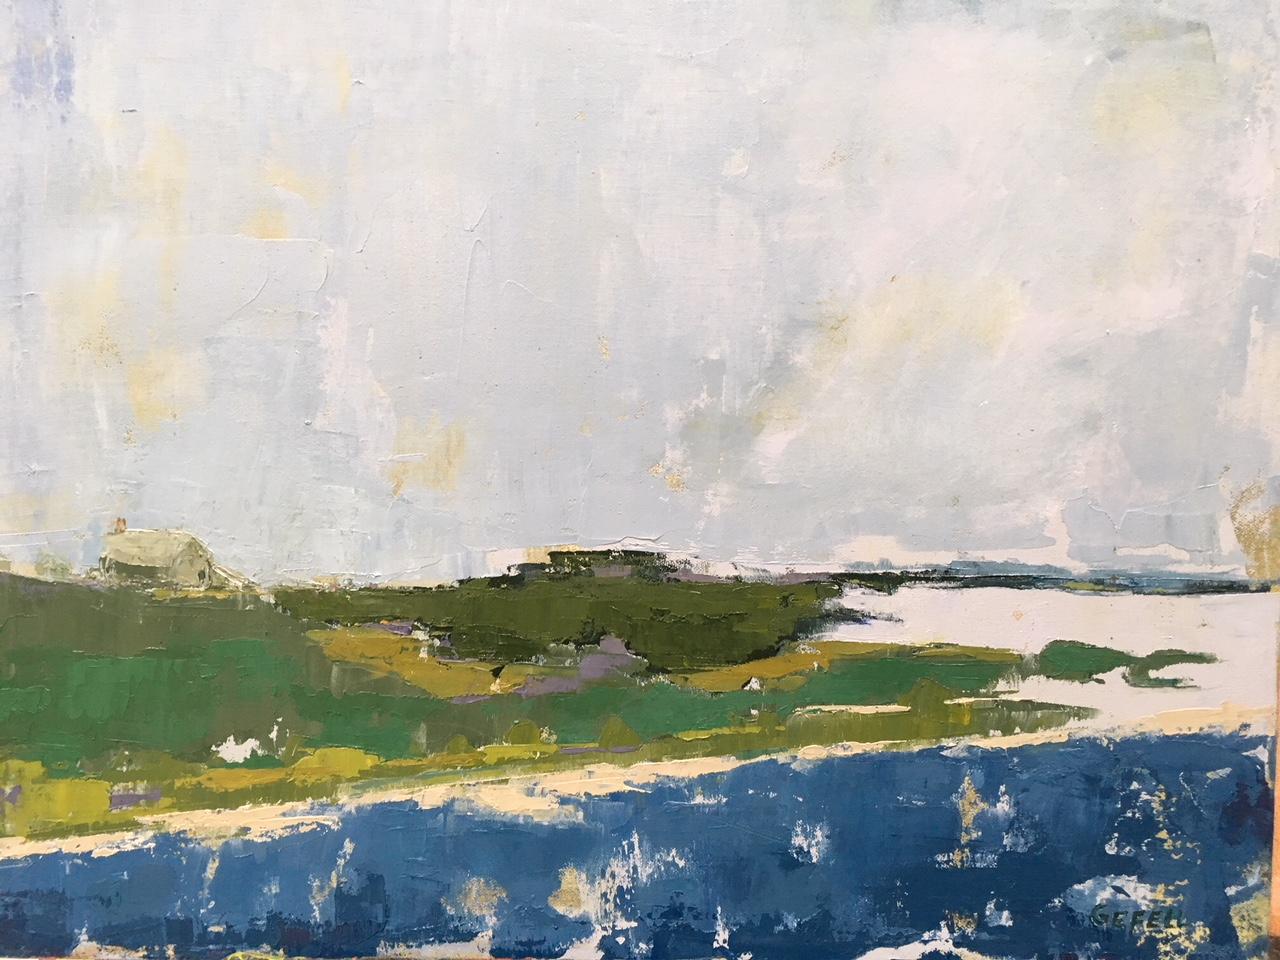 Solitude (oil on canvas) by artist Kathleen Gefell, New York